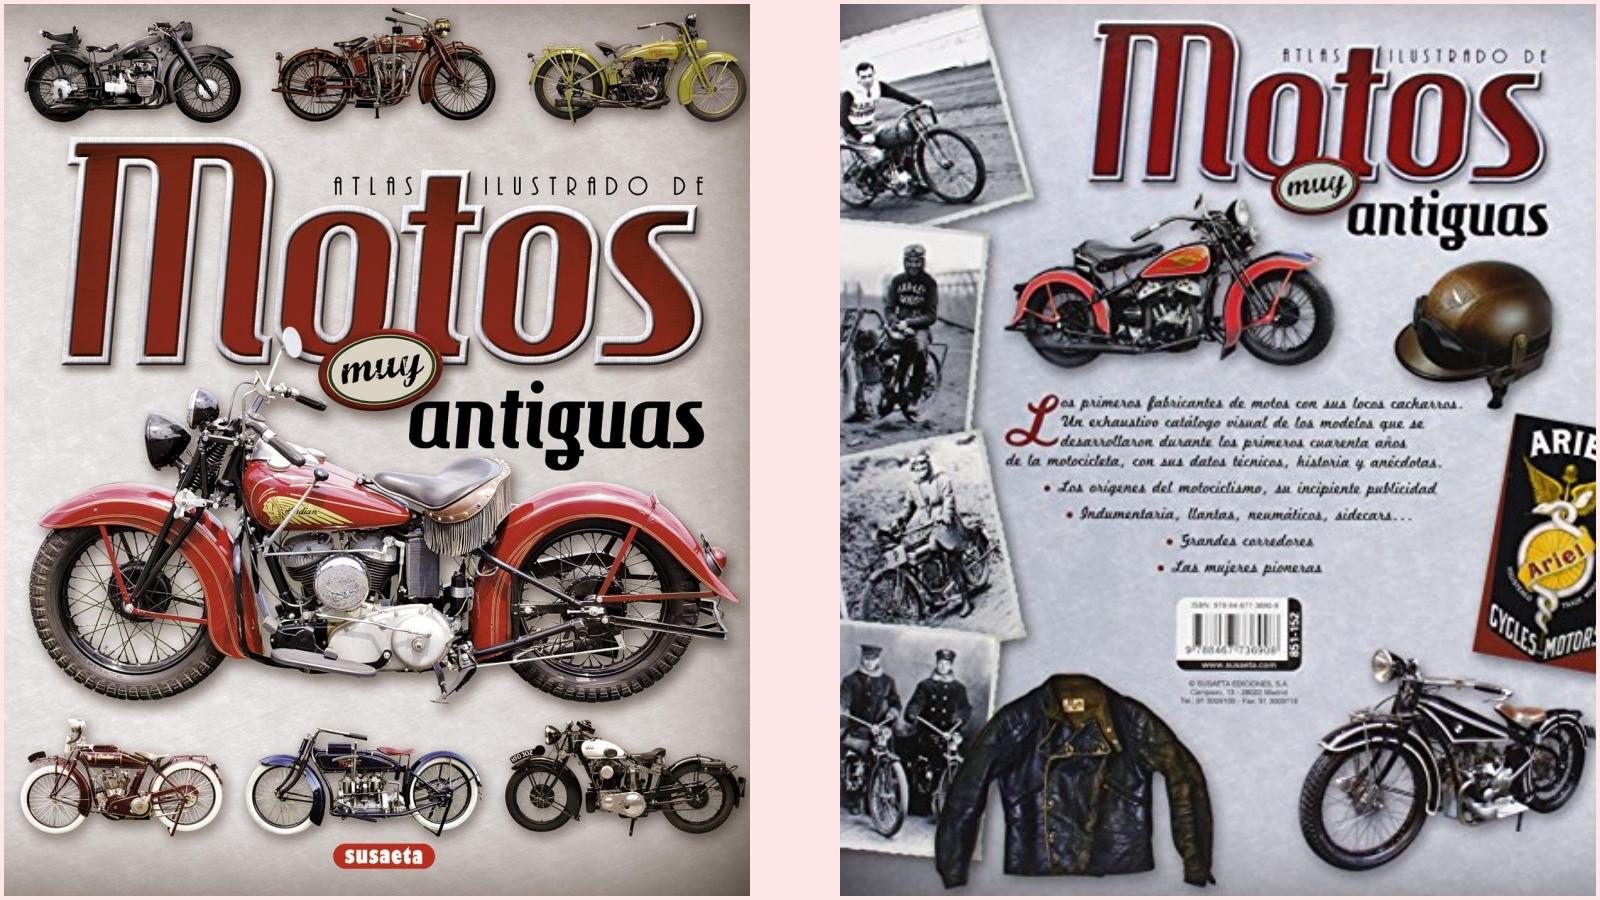 Motos muy antiguas (Atlas ilustrado) / Juan Pablo Ruiz Palacio